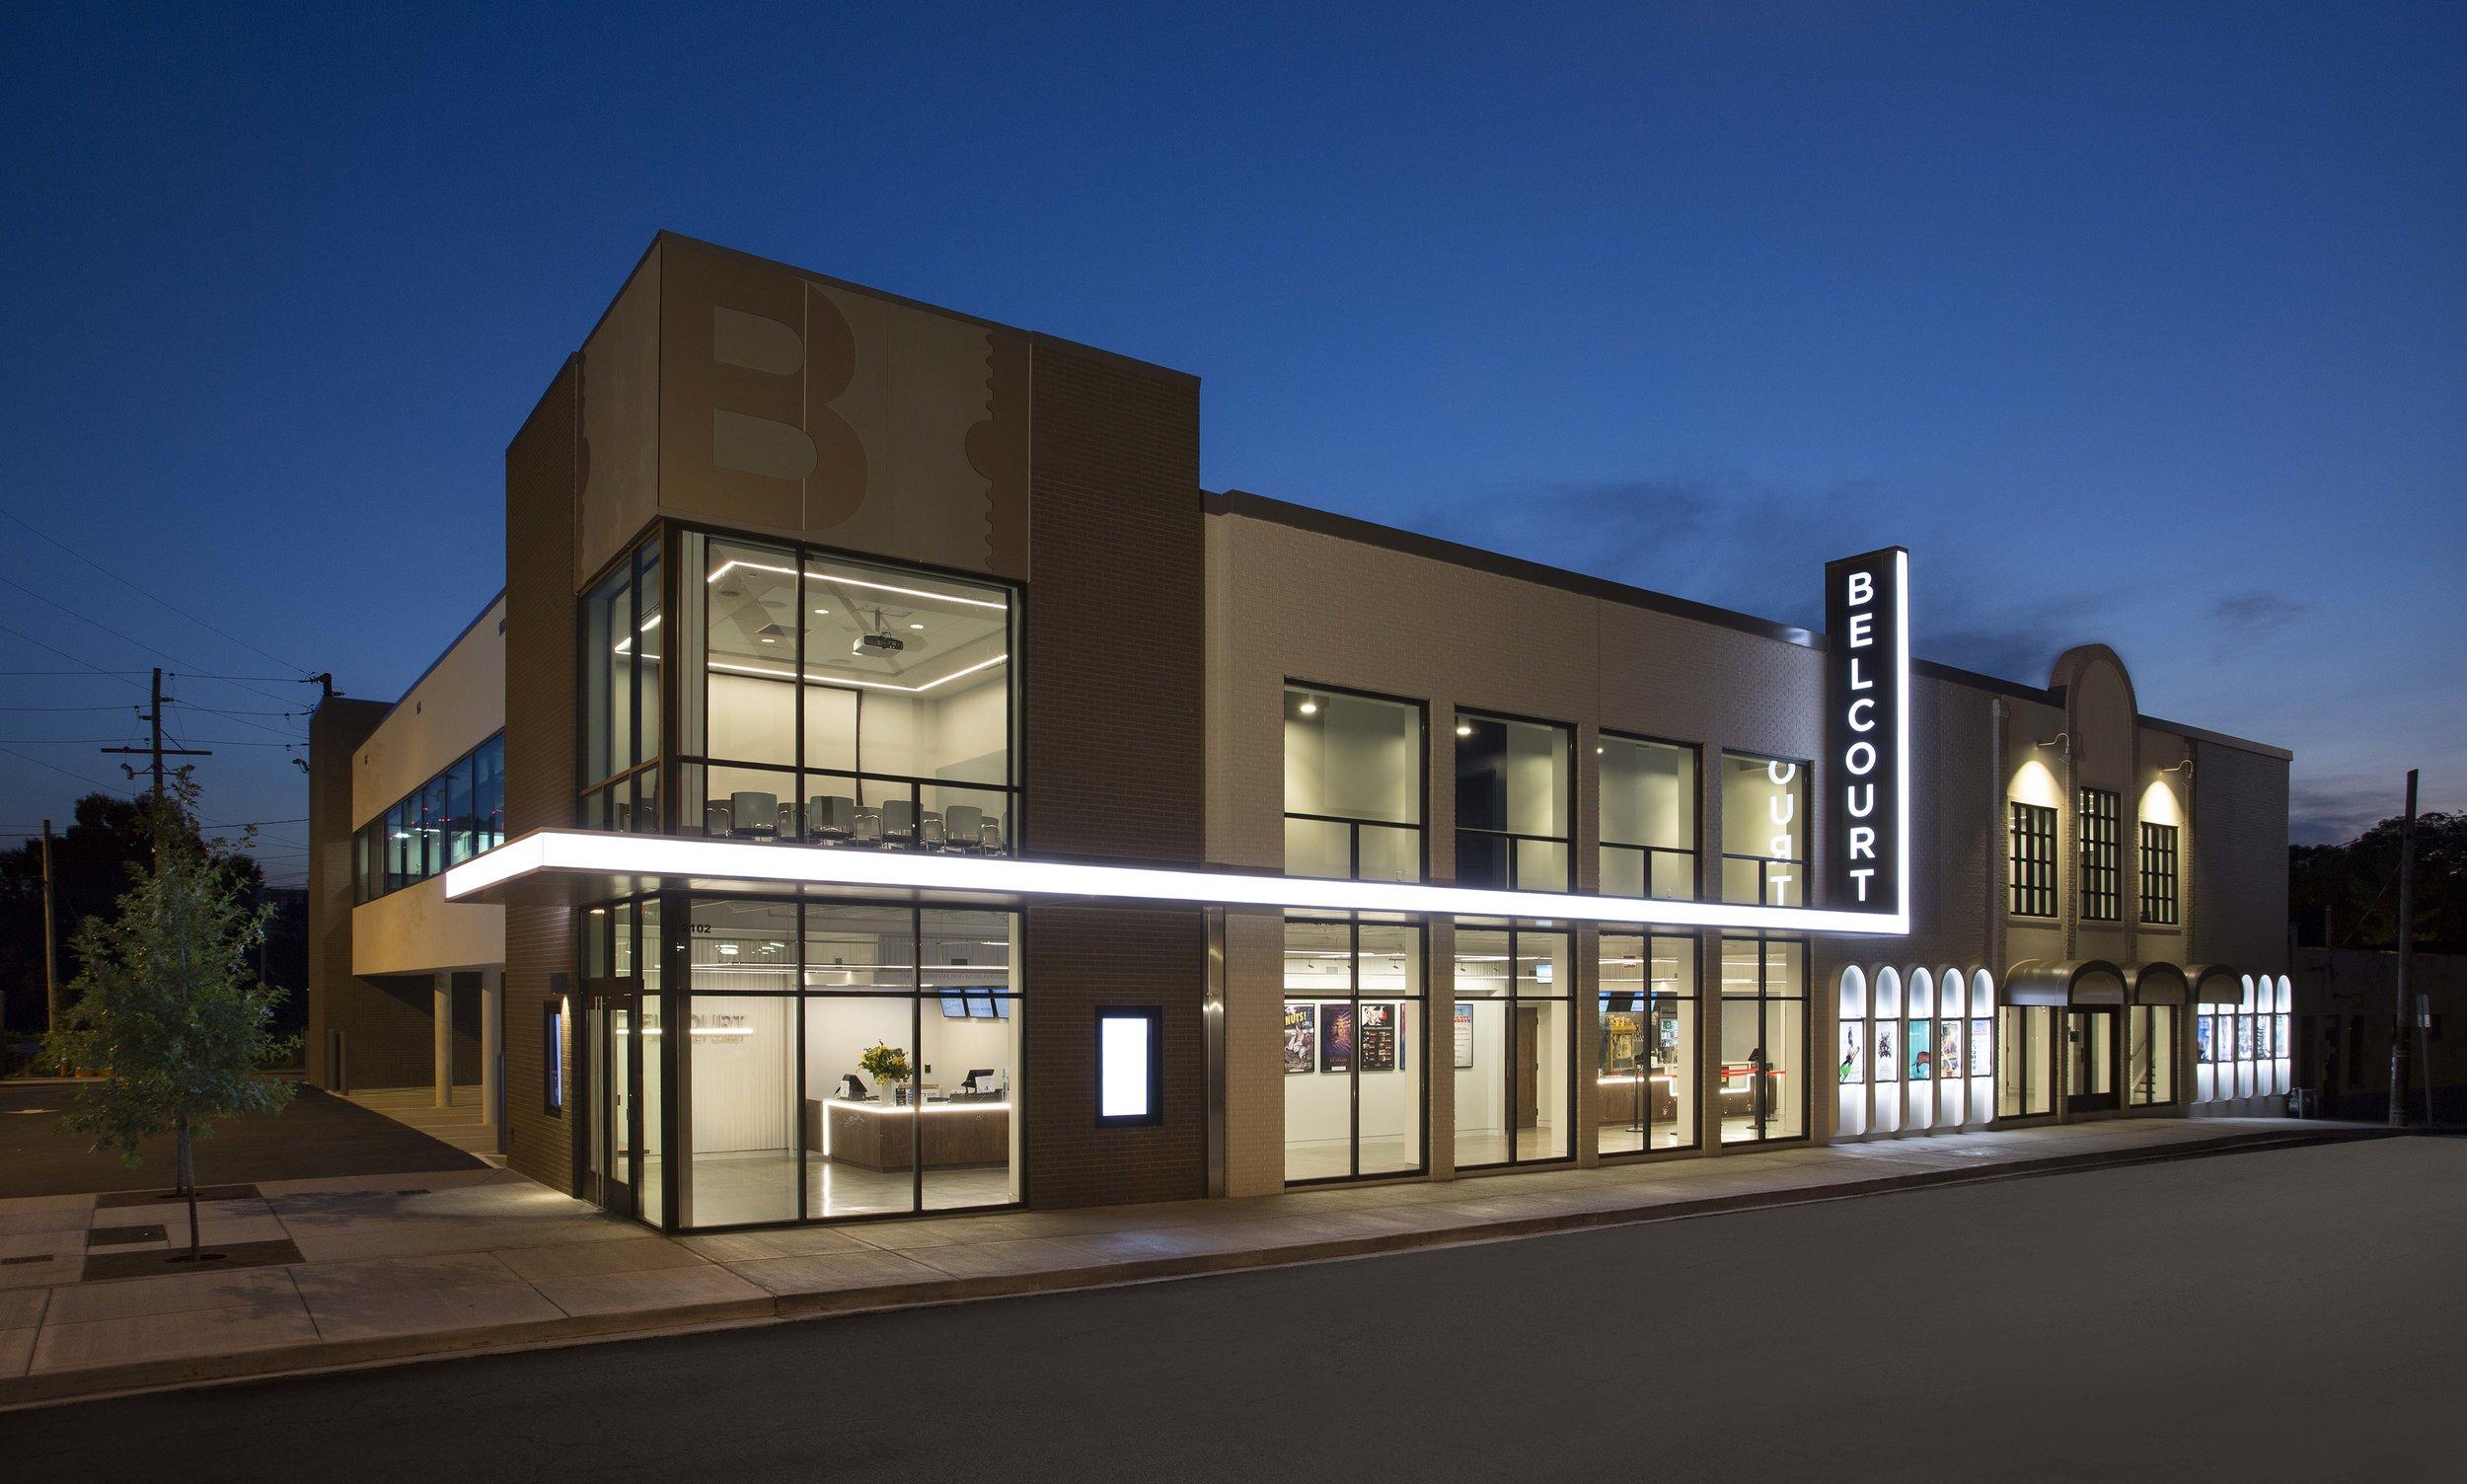 The Belcourt Theatre